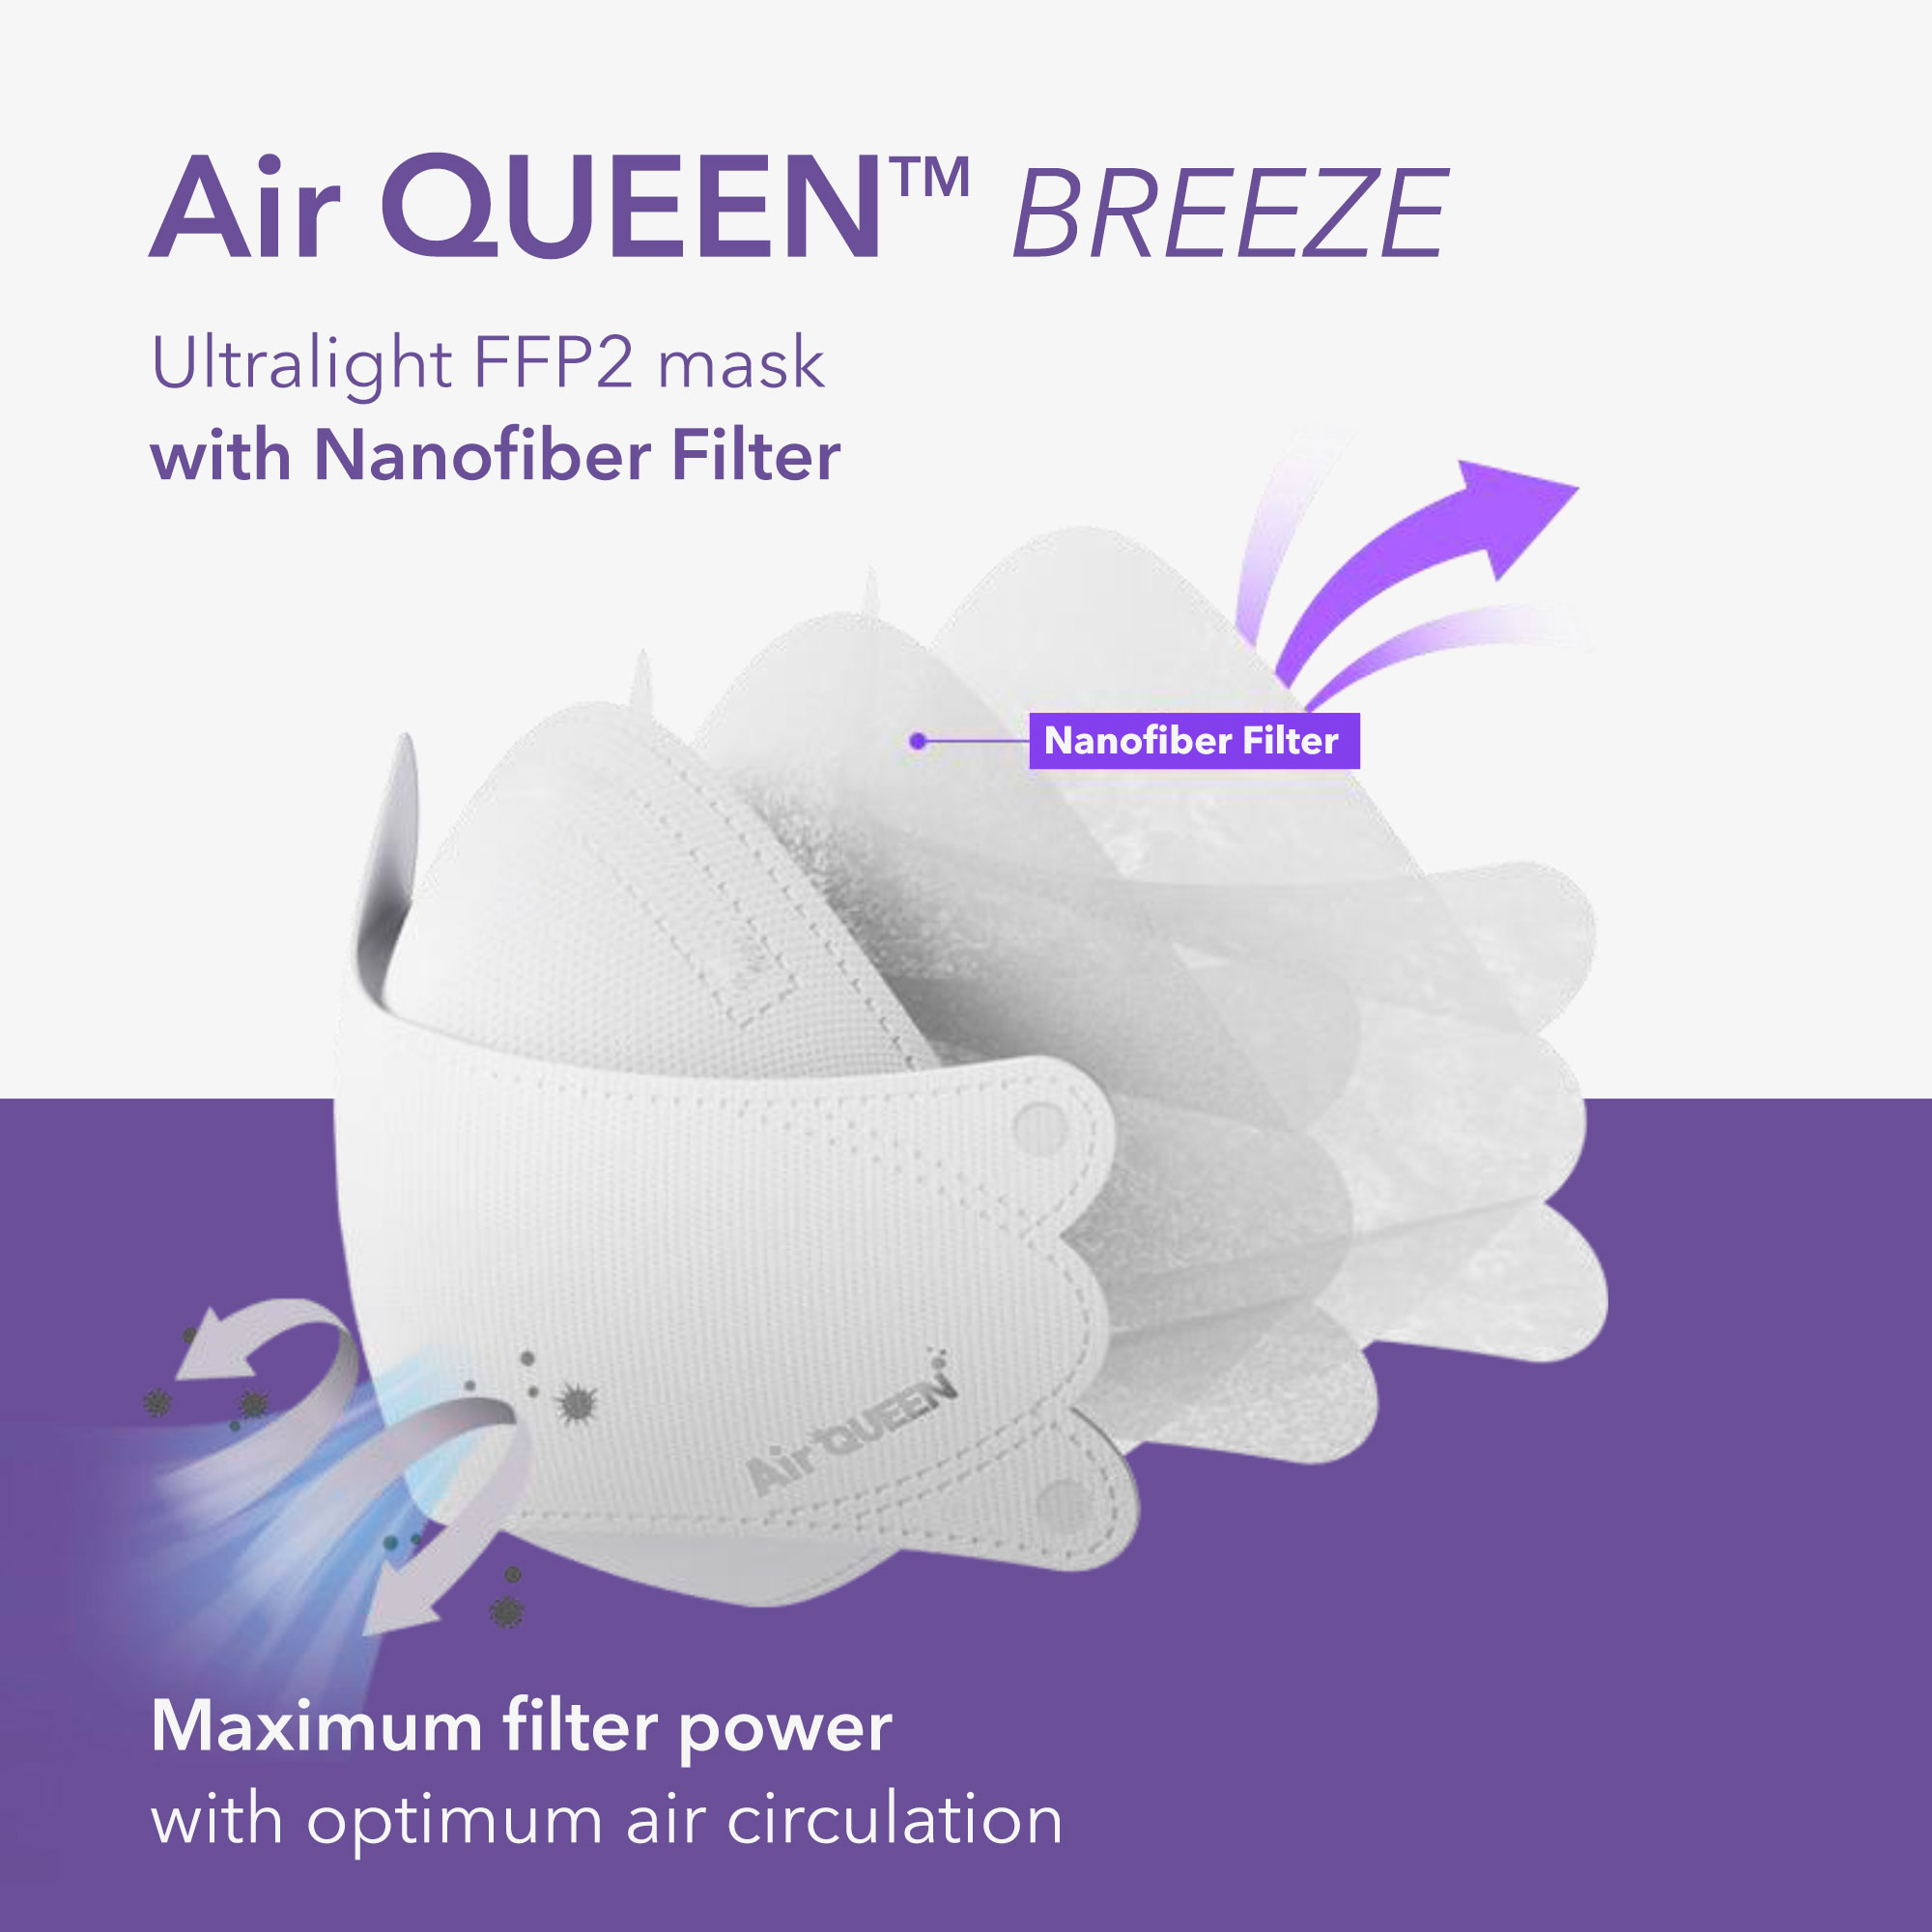 AirQUEEN Breeze FFP2 Mask